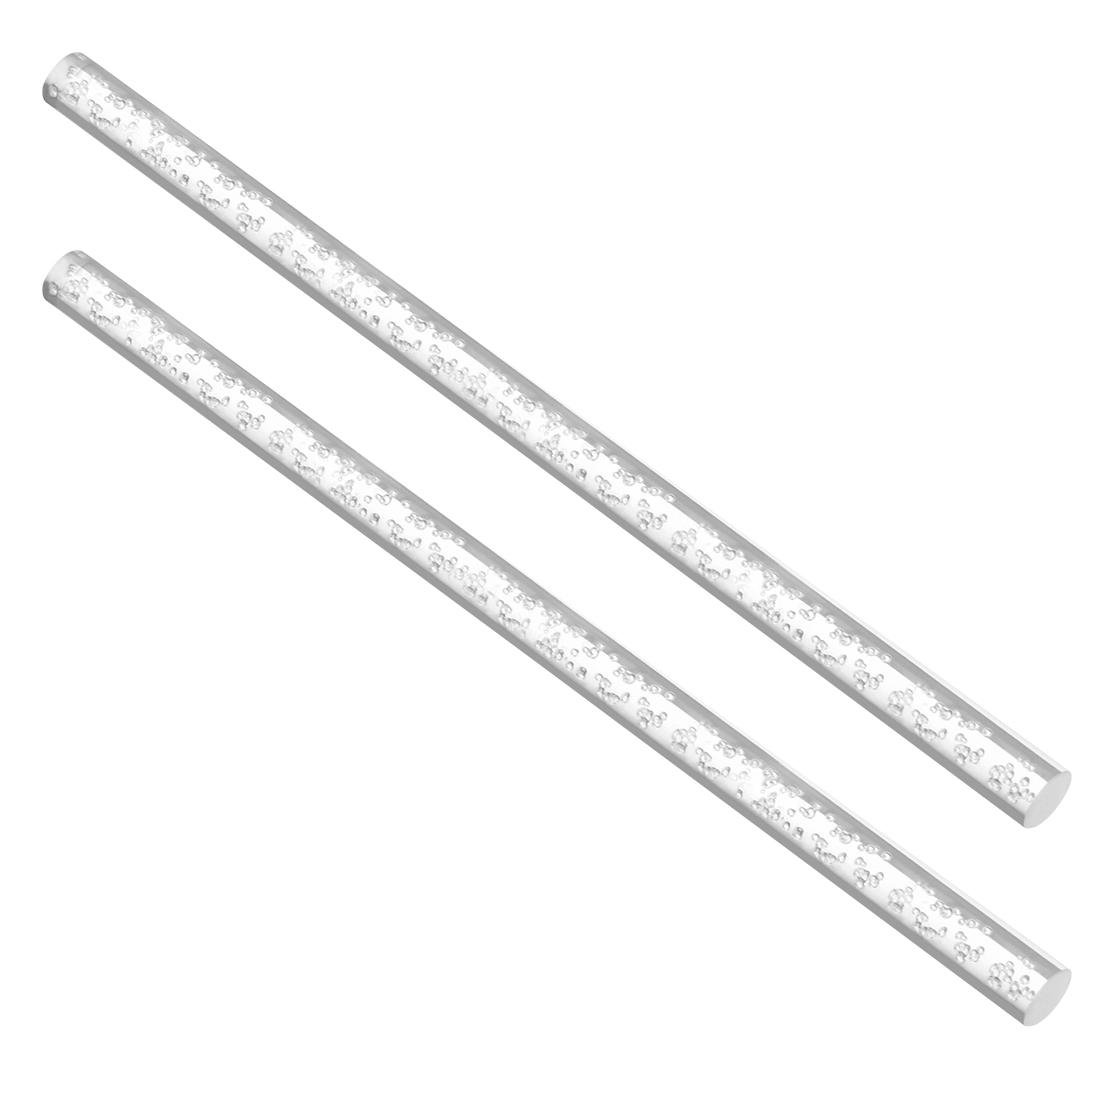 10mm Dia 250mm Long Air Bubble Acrylic Rod PMMA Circular Bar Clear 2pcs